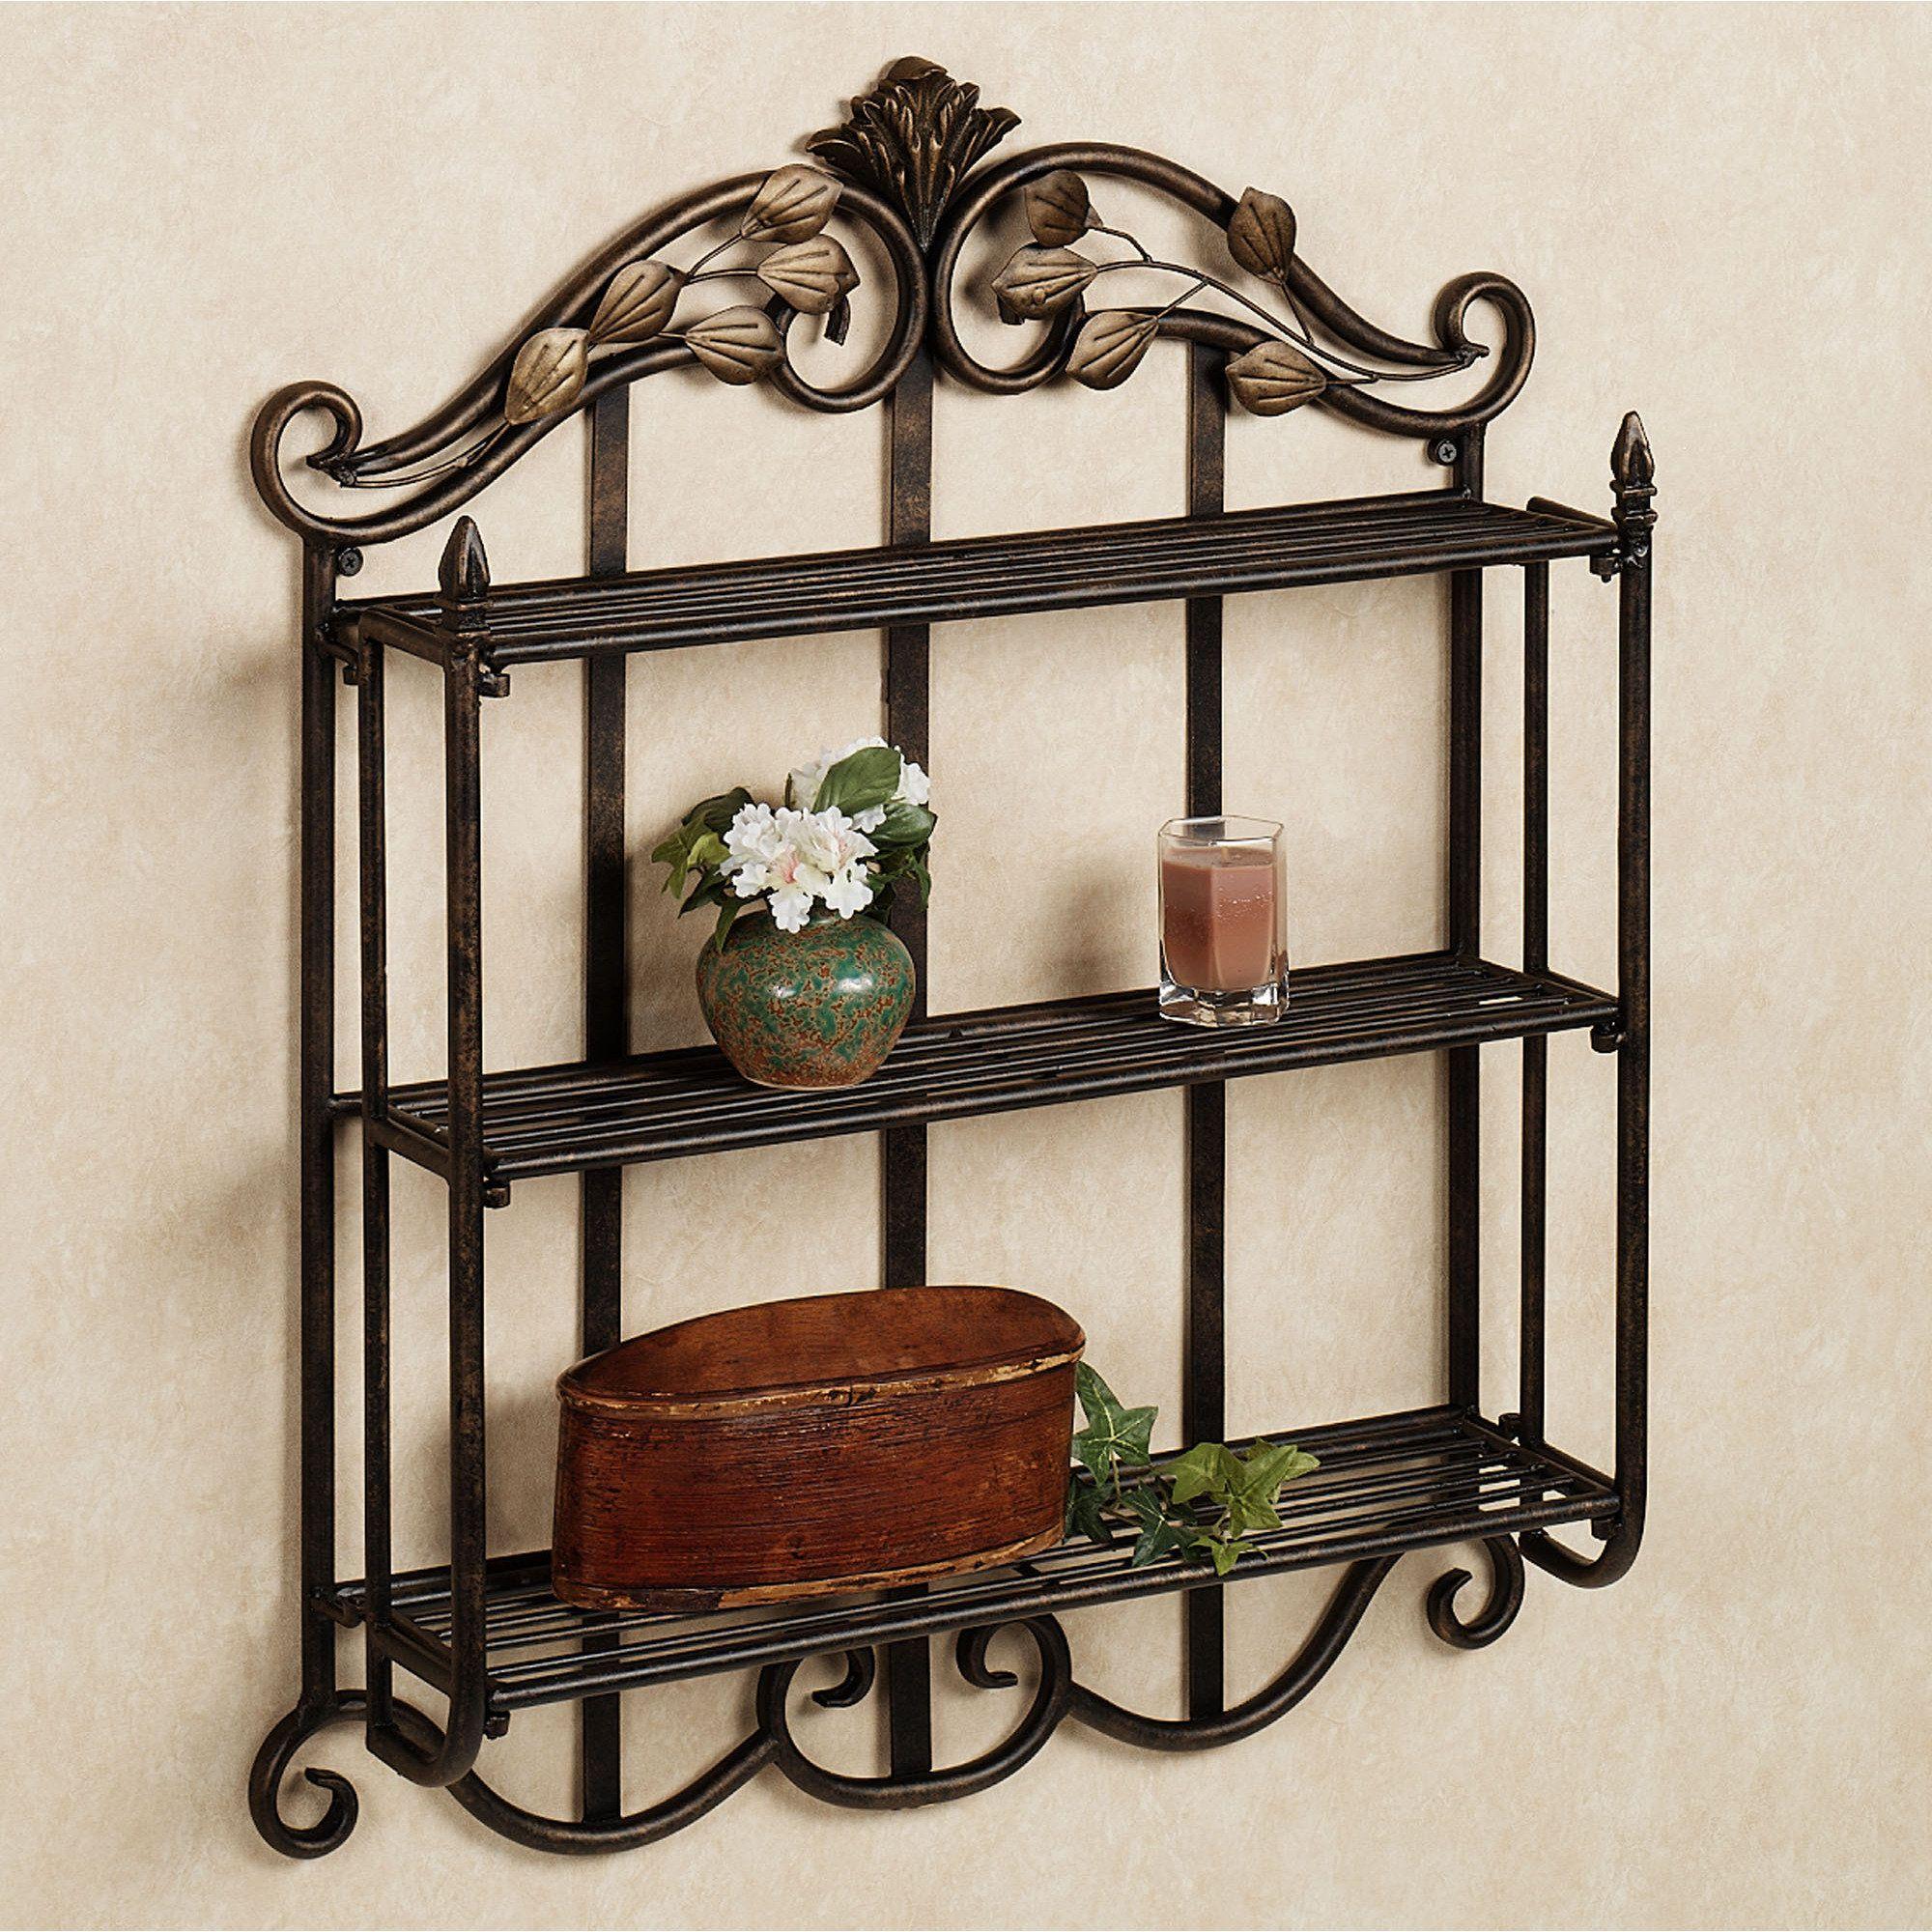 corner shelf wroght iron google search wrought iron. Black Bedroom Furniture Sets. Home Design Ideas